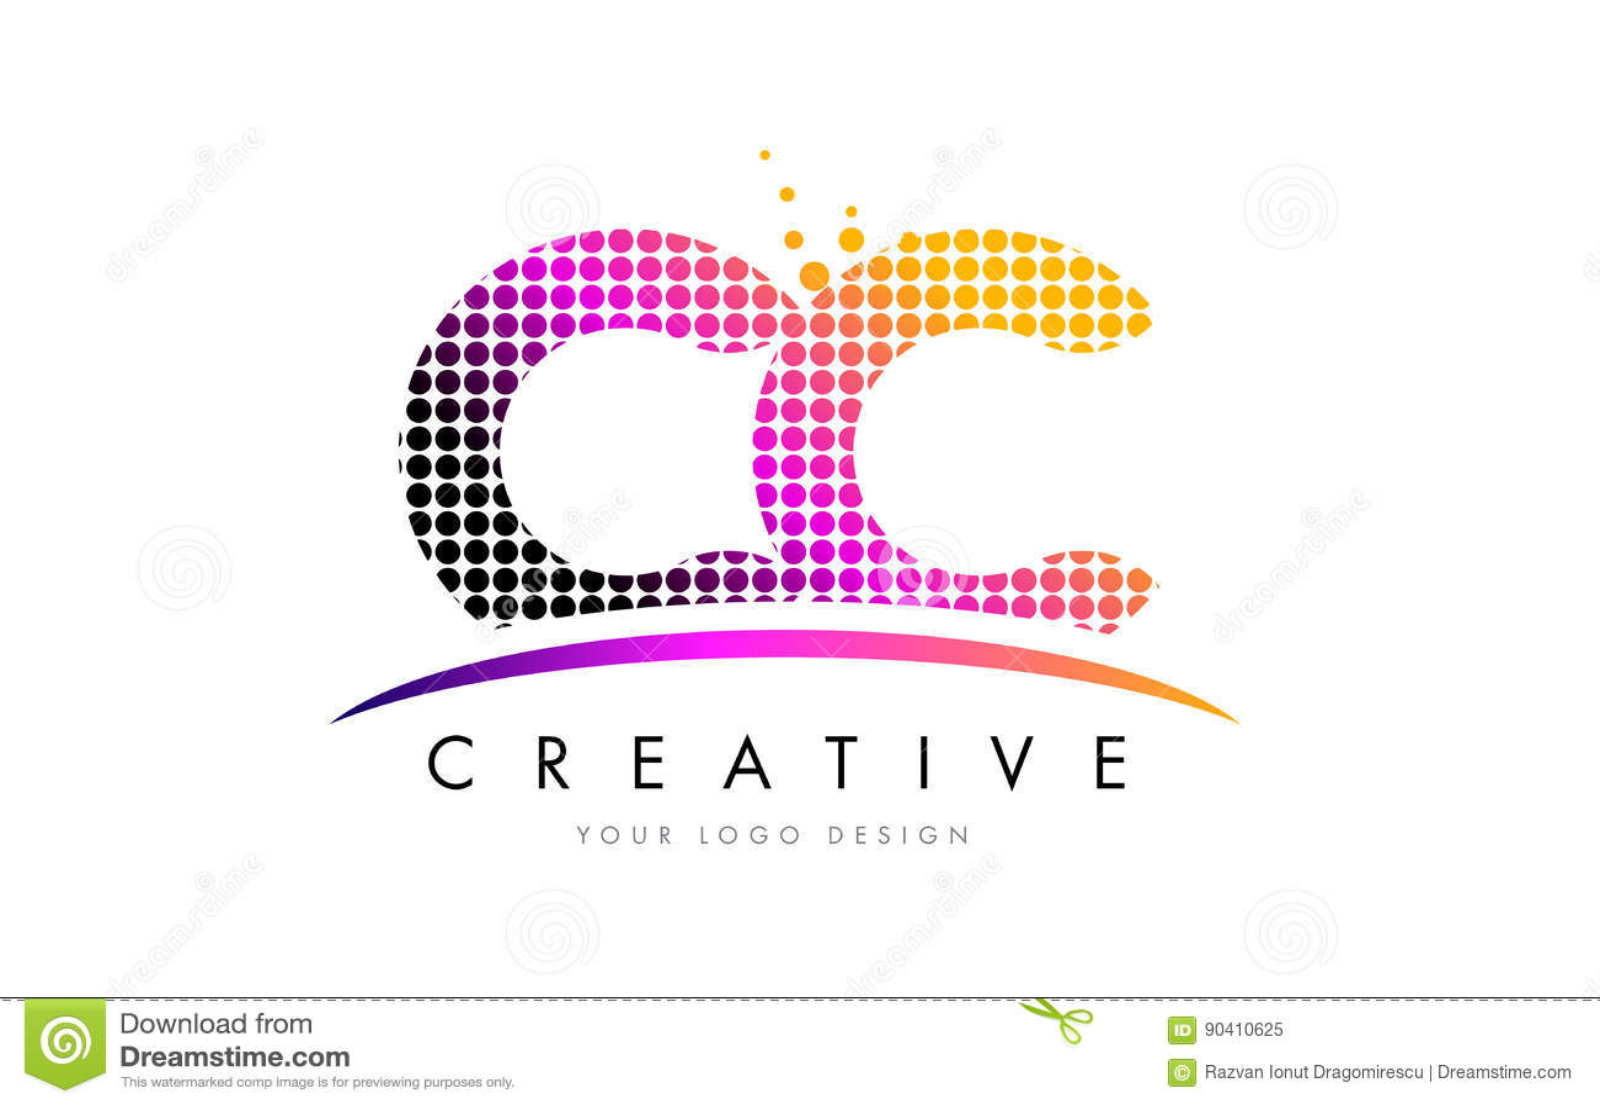 Cc c c letter logo design with magenta dots and swoosh stock vector download cc c c letter logo design with magenta dots and swoosh stock vector illustration of altavistaventures Images